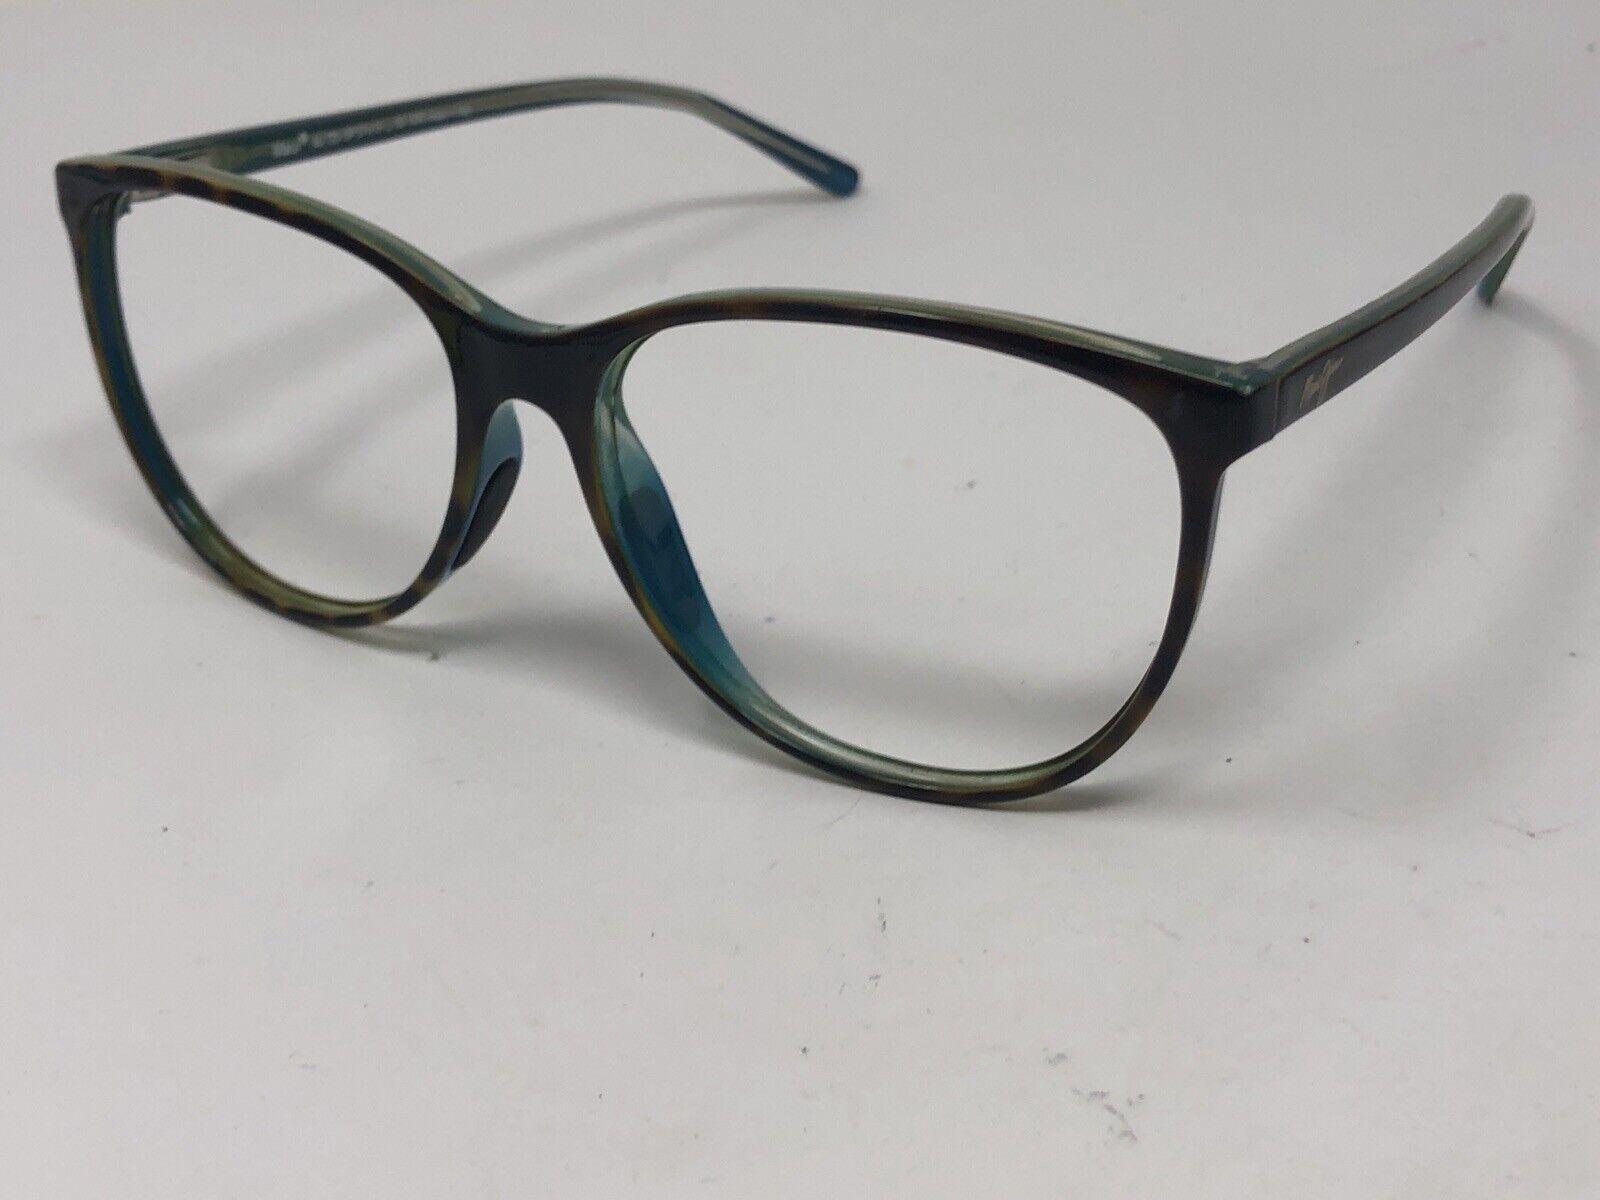 MAUI JIM OCEAN Sunglasses Frame Italy MJ723-10P Brown Tortoise 57-16-135 GW71